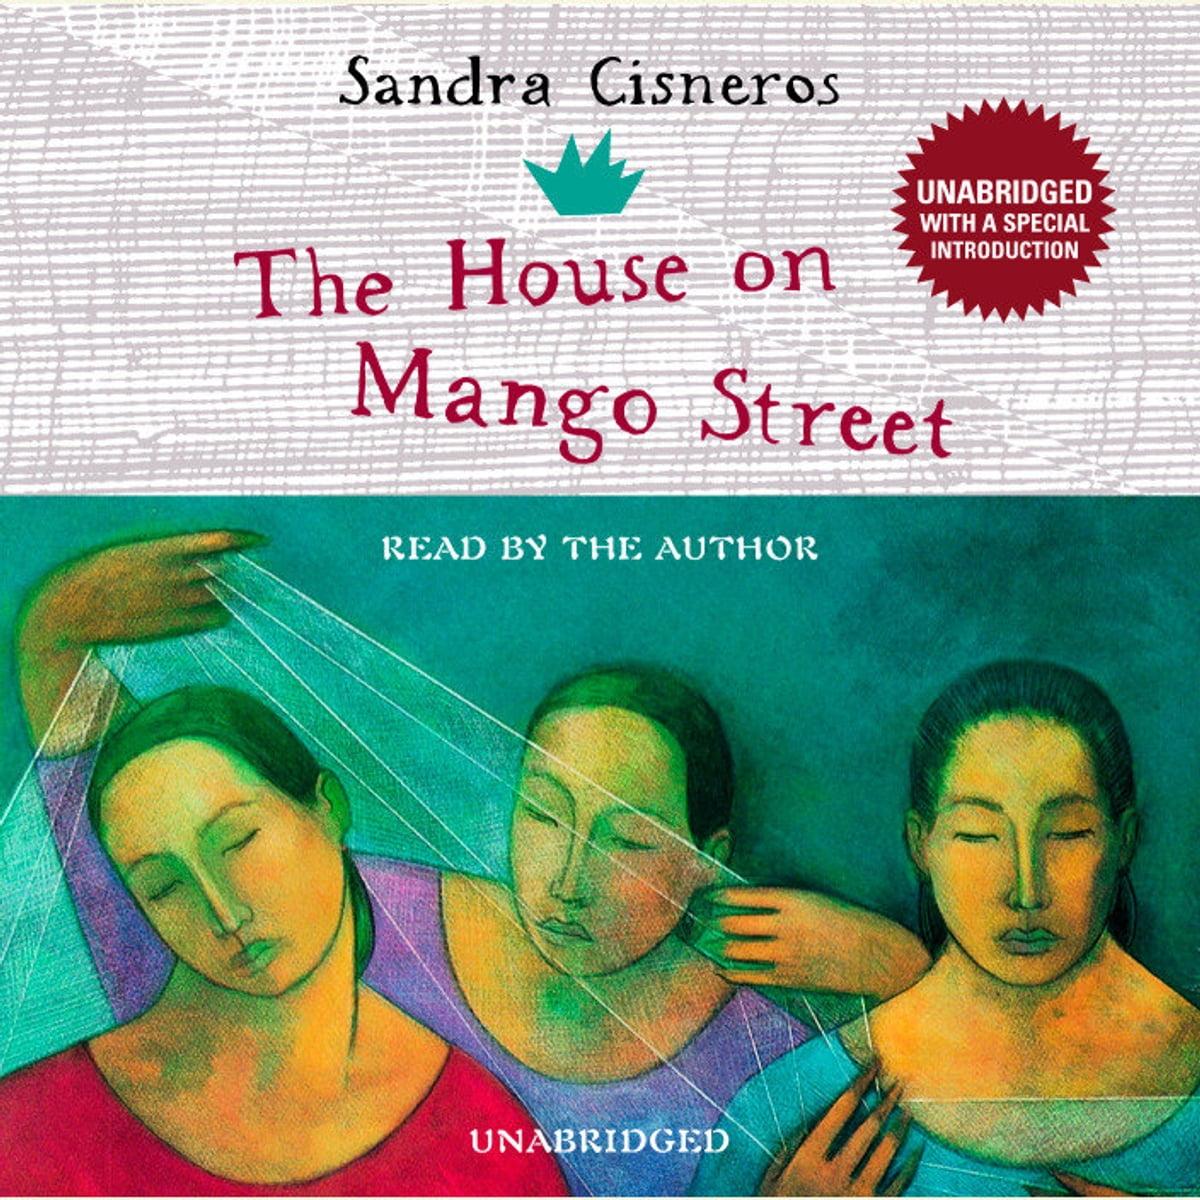 The House on Mango Street Audiobook by Sandra Cisneros  9780739322819  Rakuten Kobo